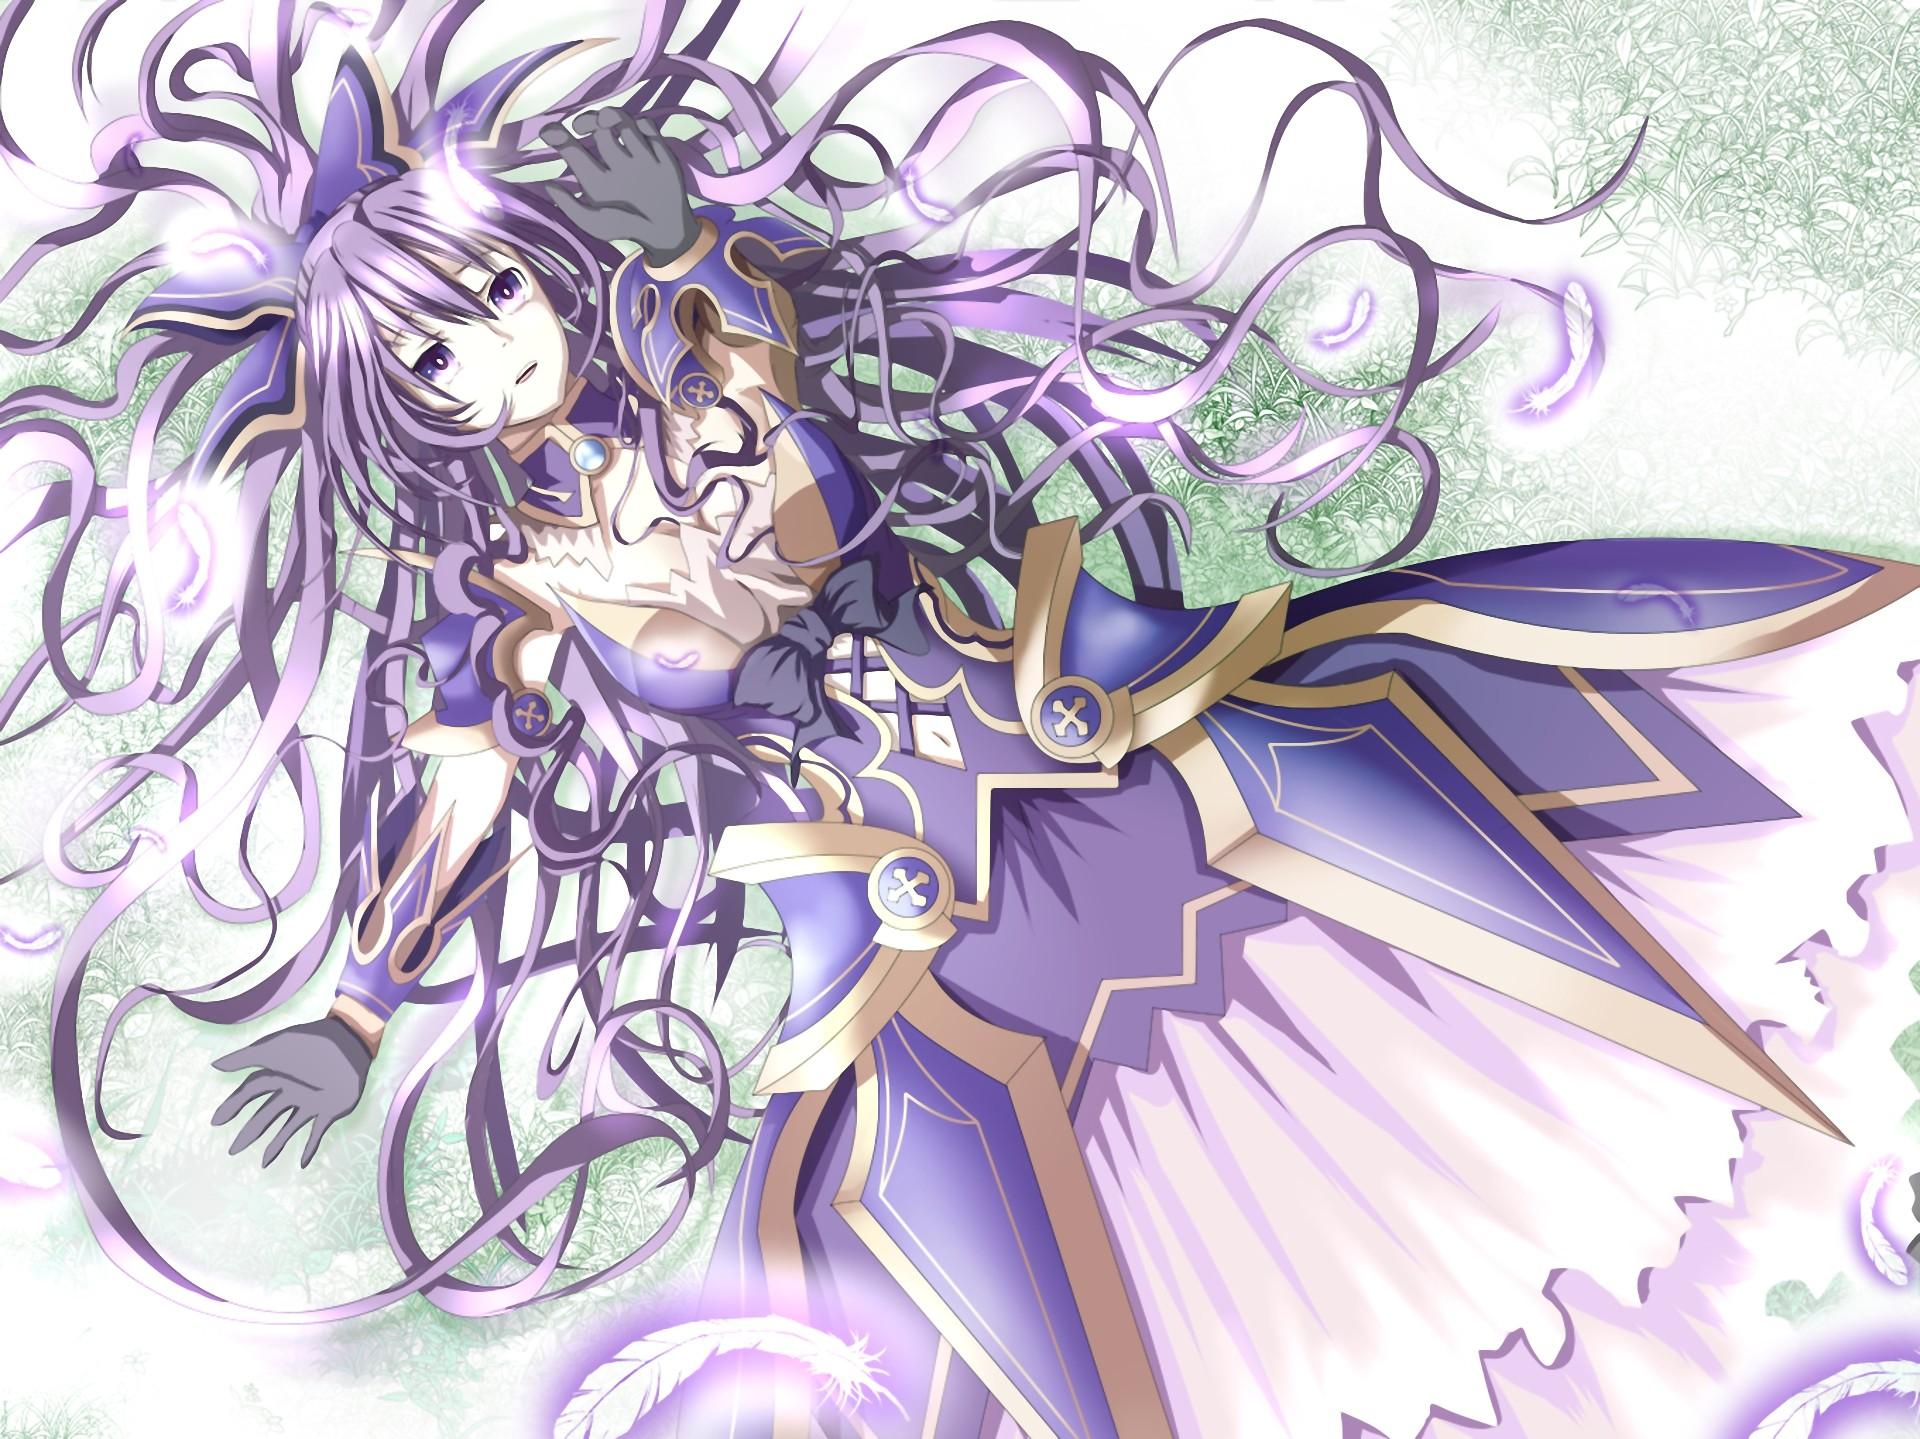 Wallpaper Gambar Ilustrasi Gadis Anime Date A Live